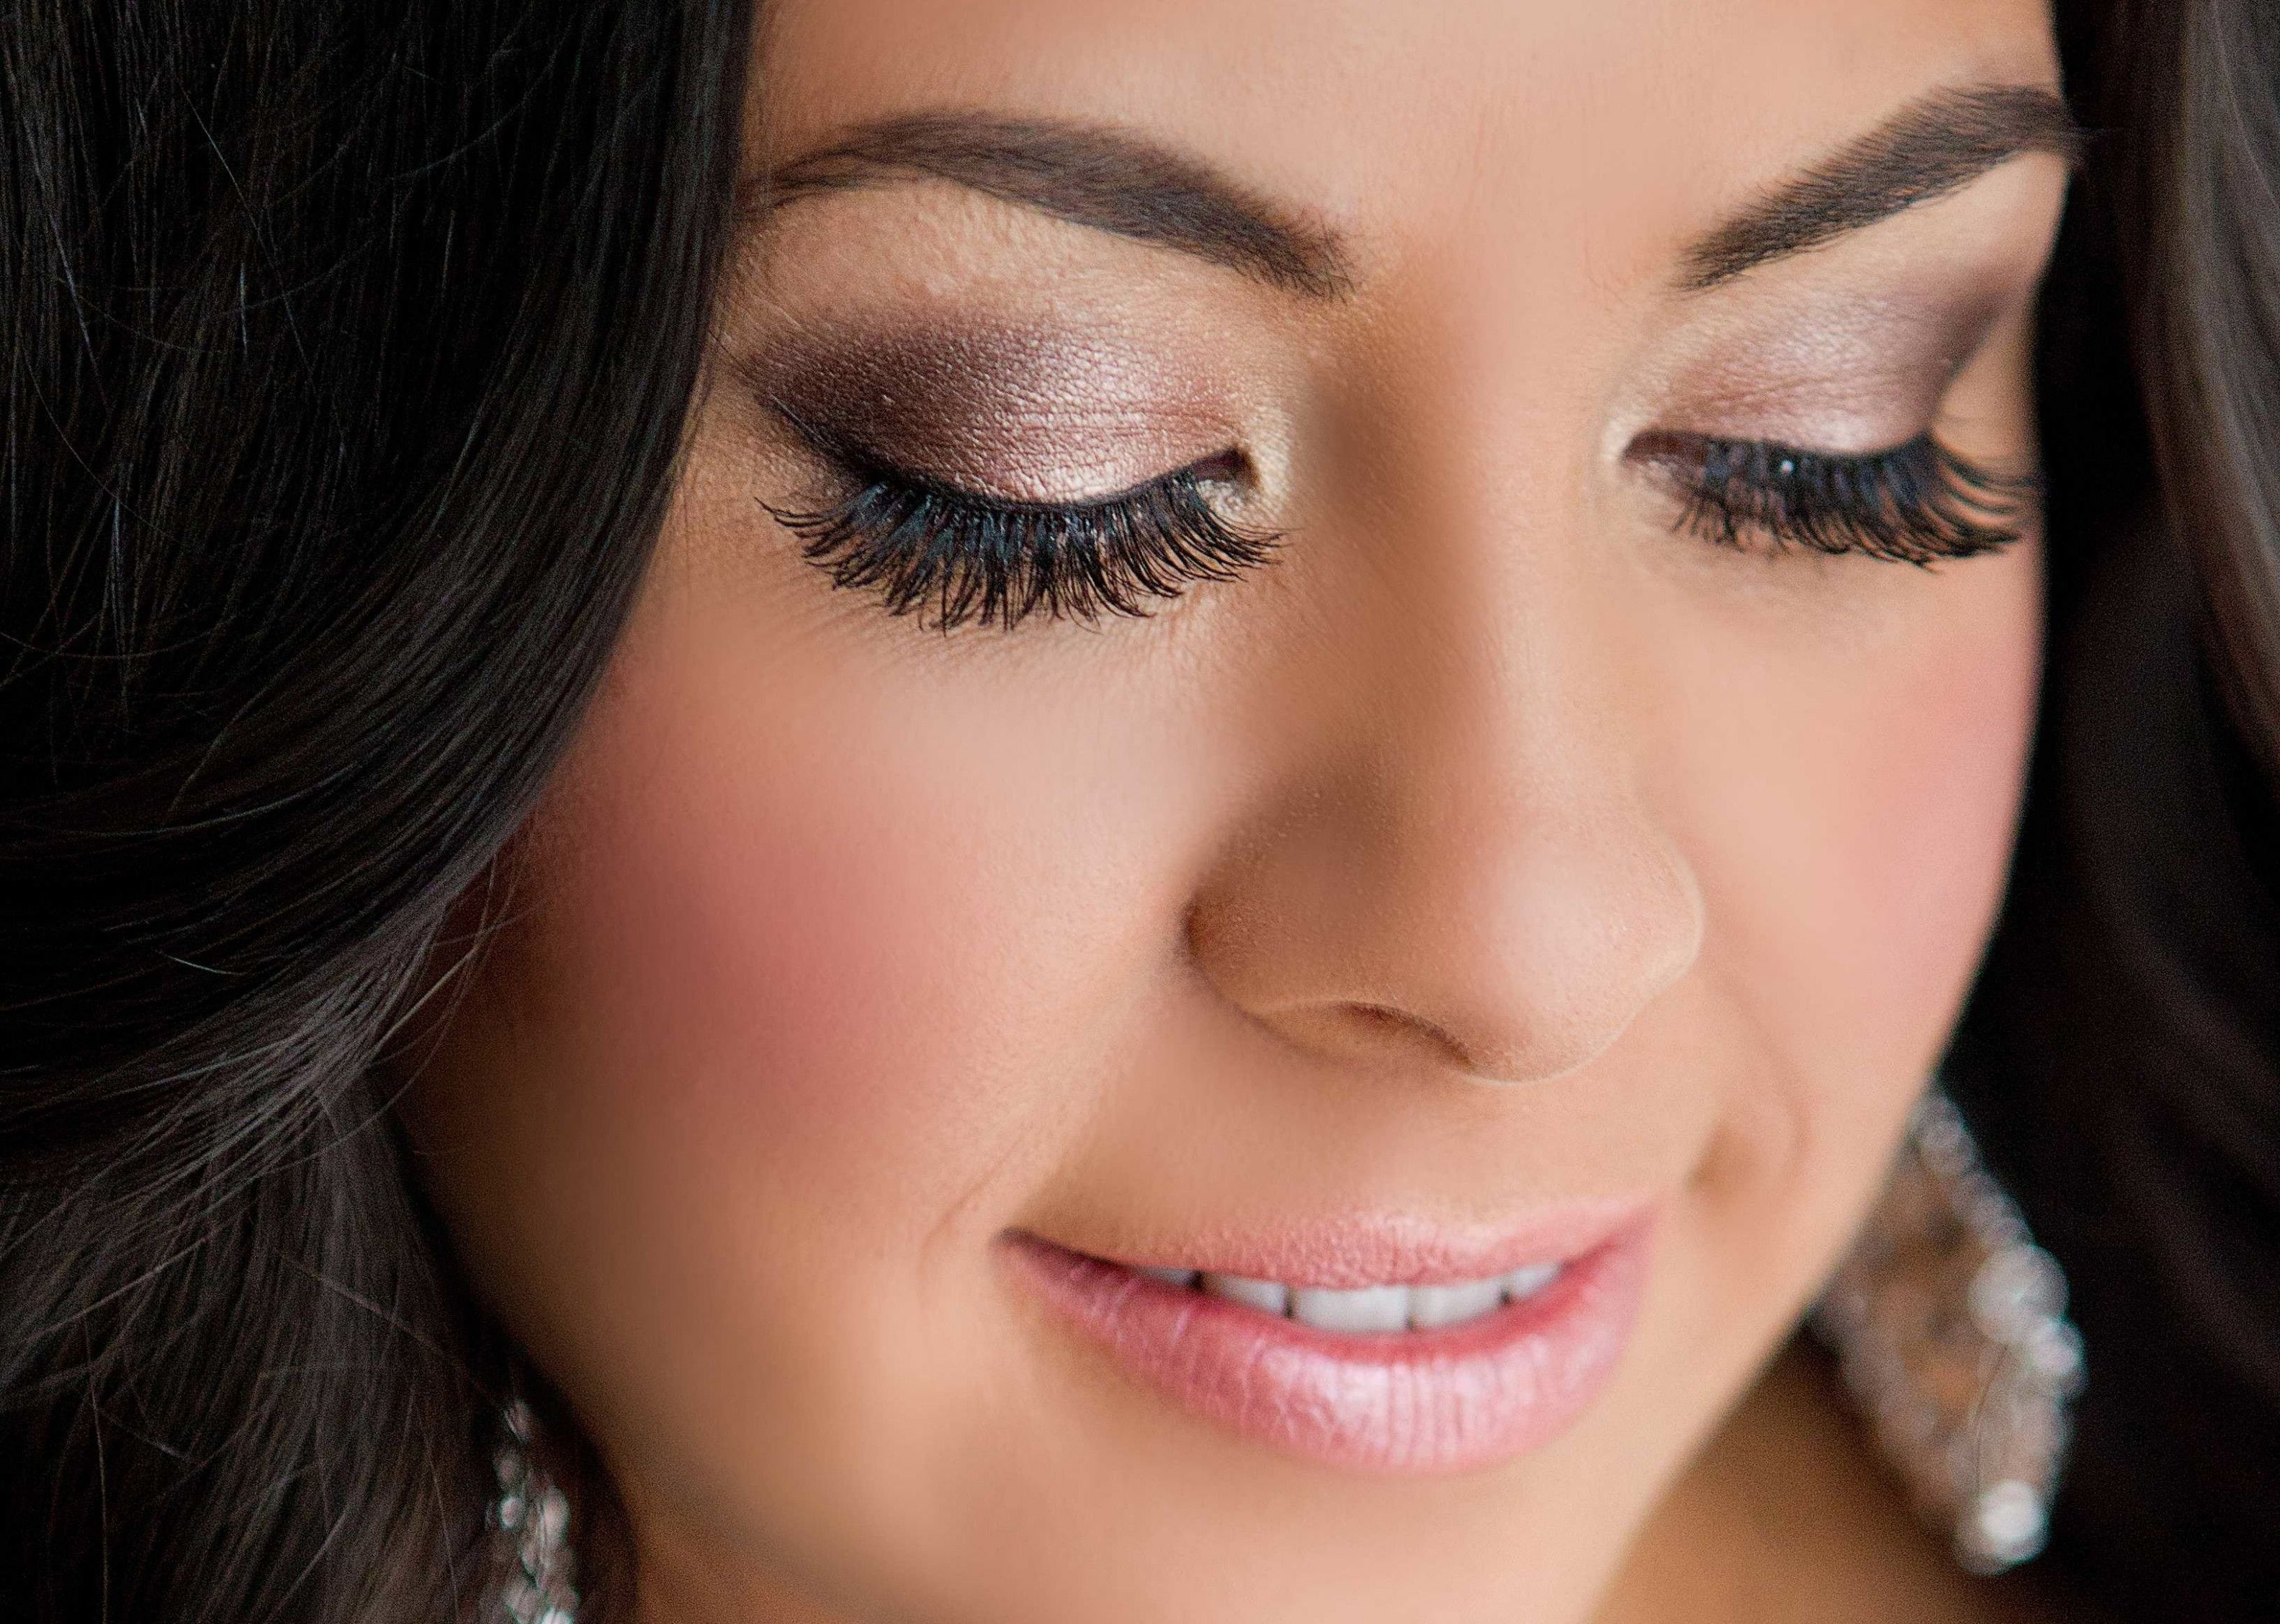 wedding makeup looks for hazel eyes - wavy haircut